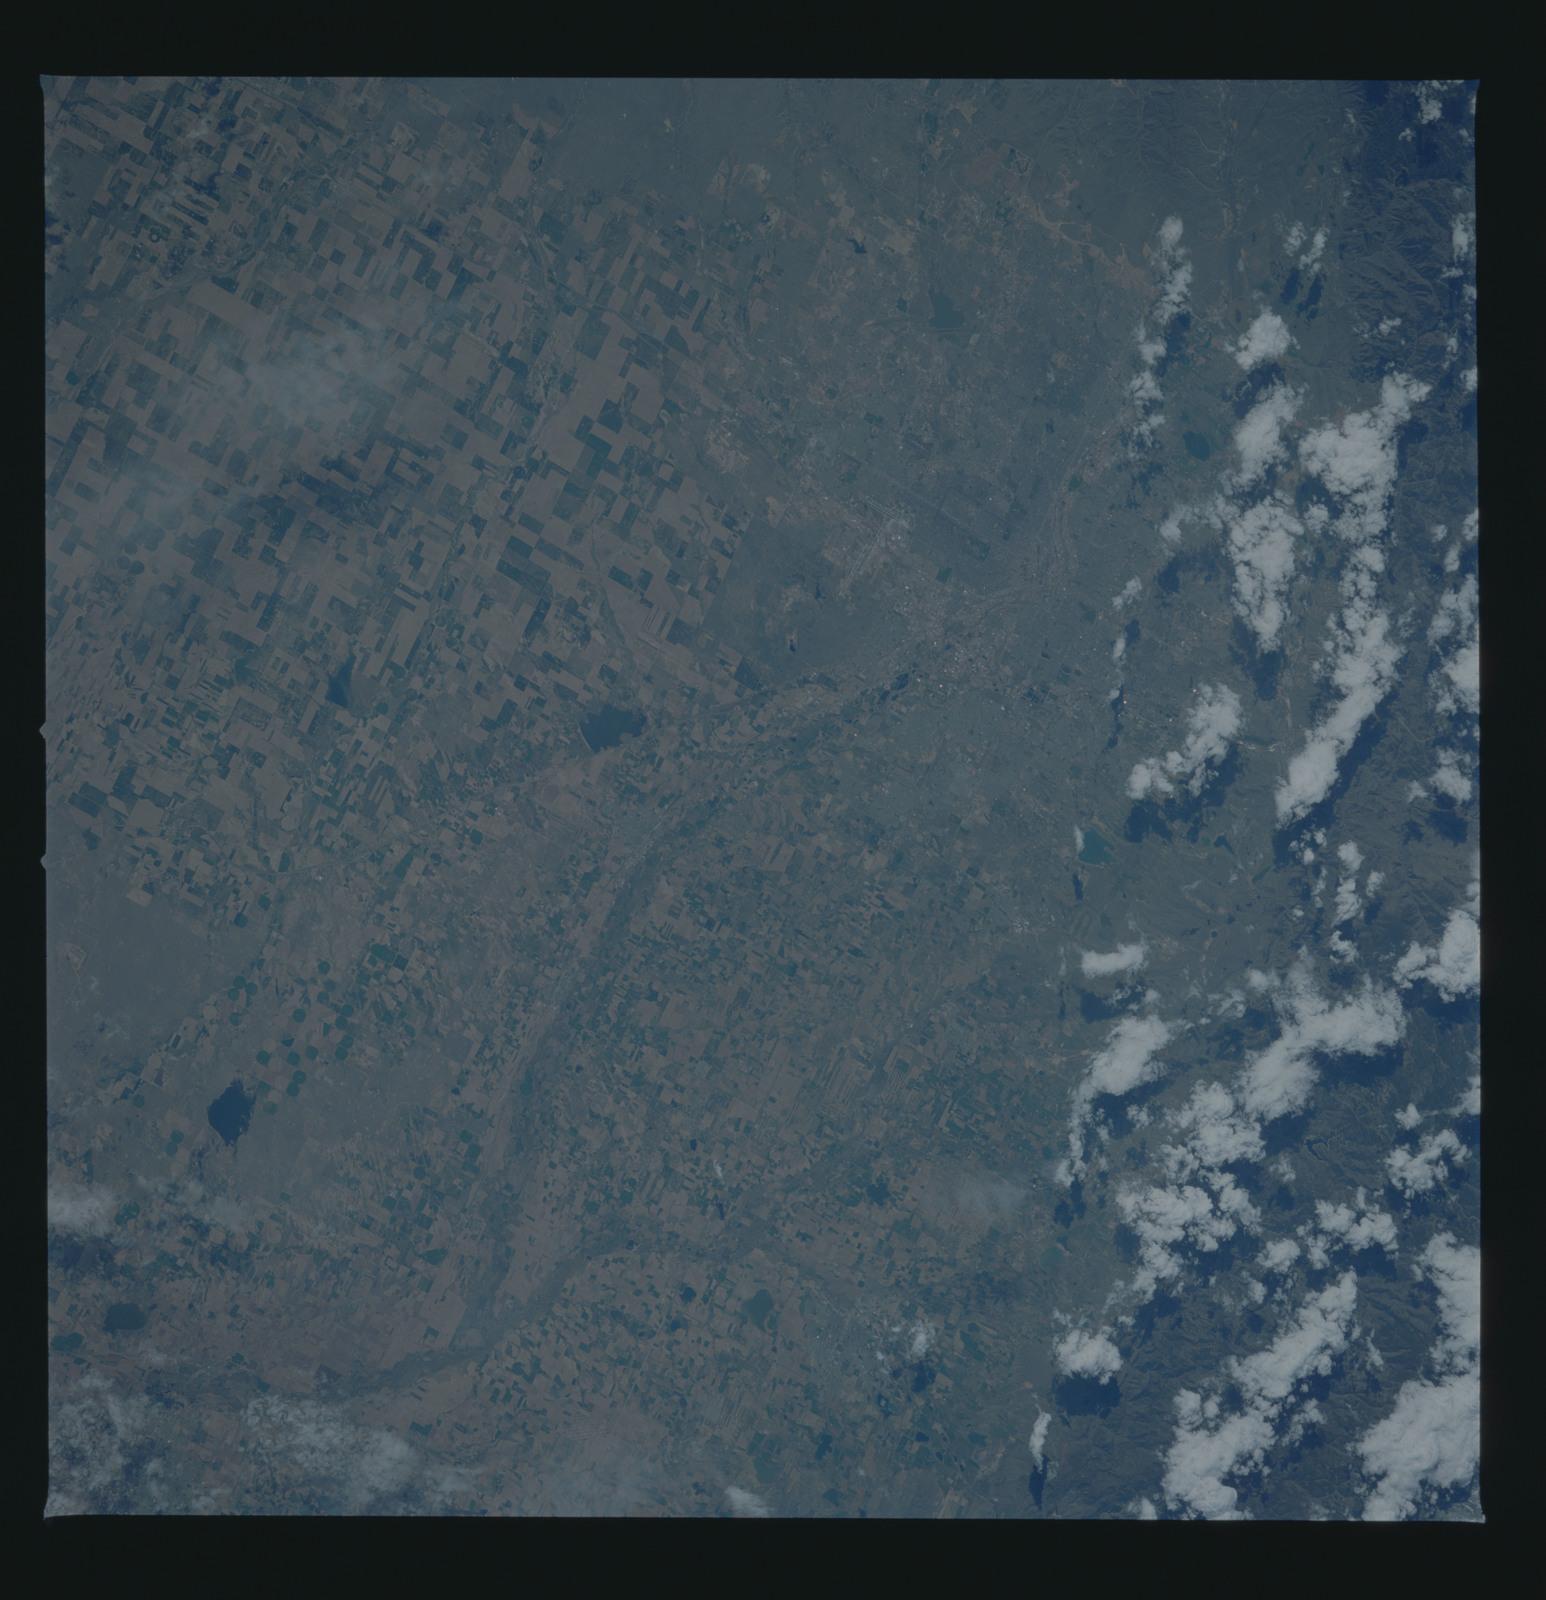 51B-53-058 - STS-51B - STS-51B earth observation